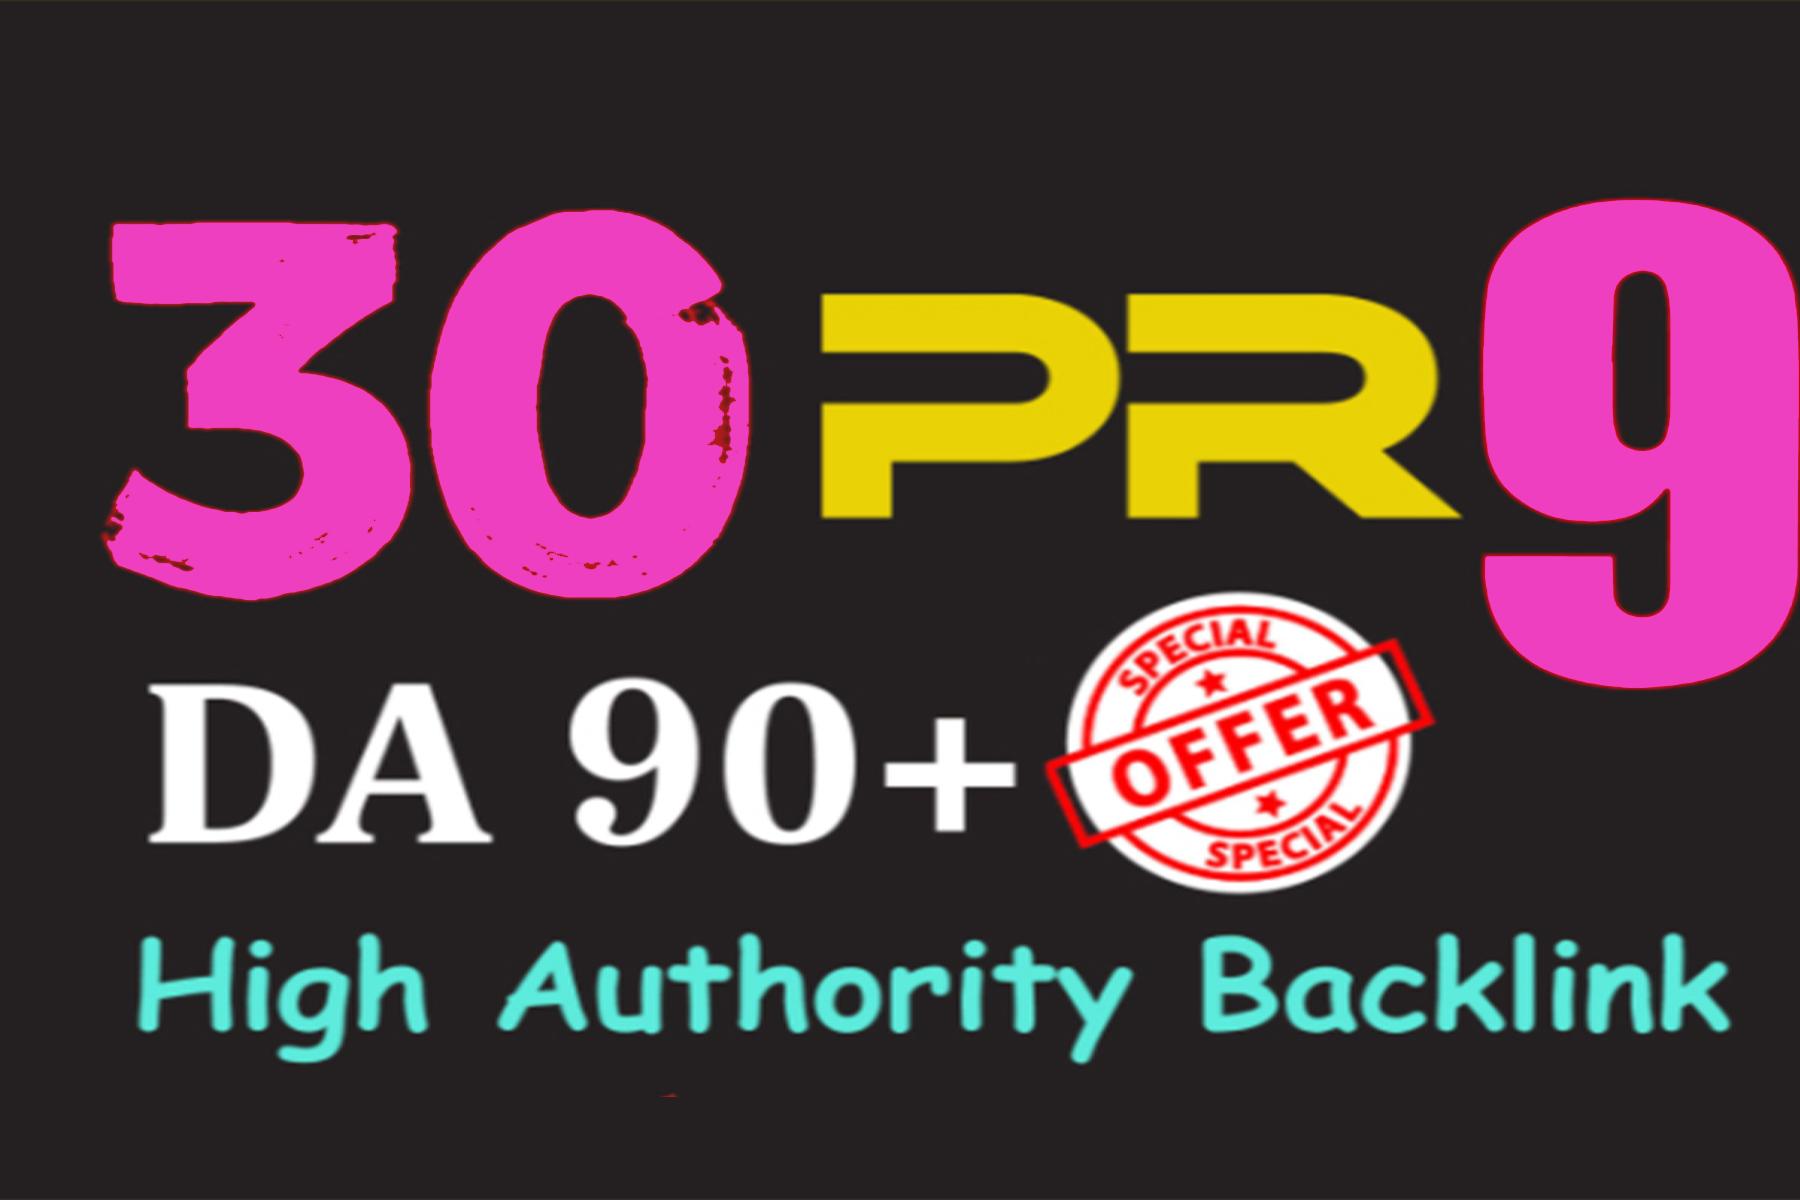 Manually Do 50 Pr9 DA 80+ Safe SEO High Authority Backlinks 30+ Domain HIGH QUALITY BACKLINKS